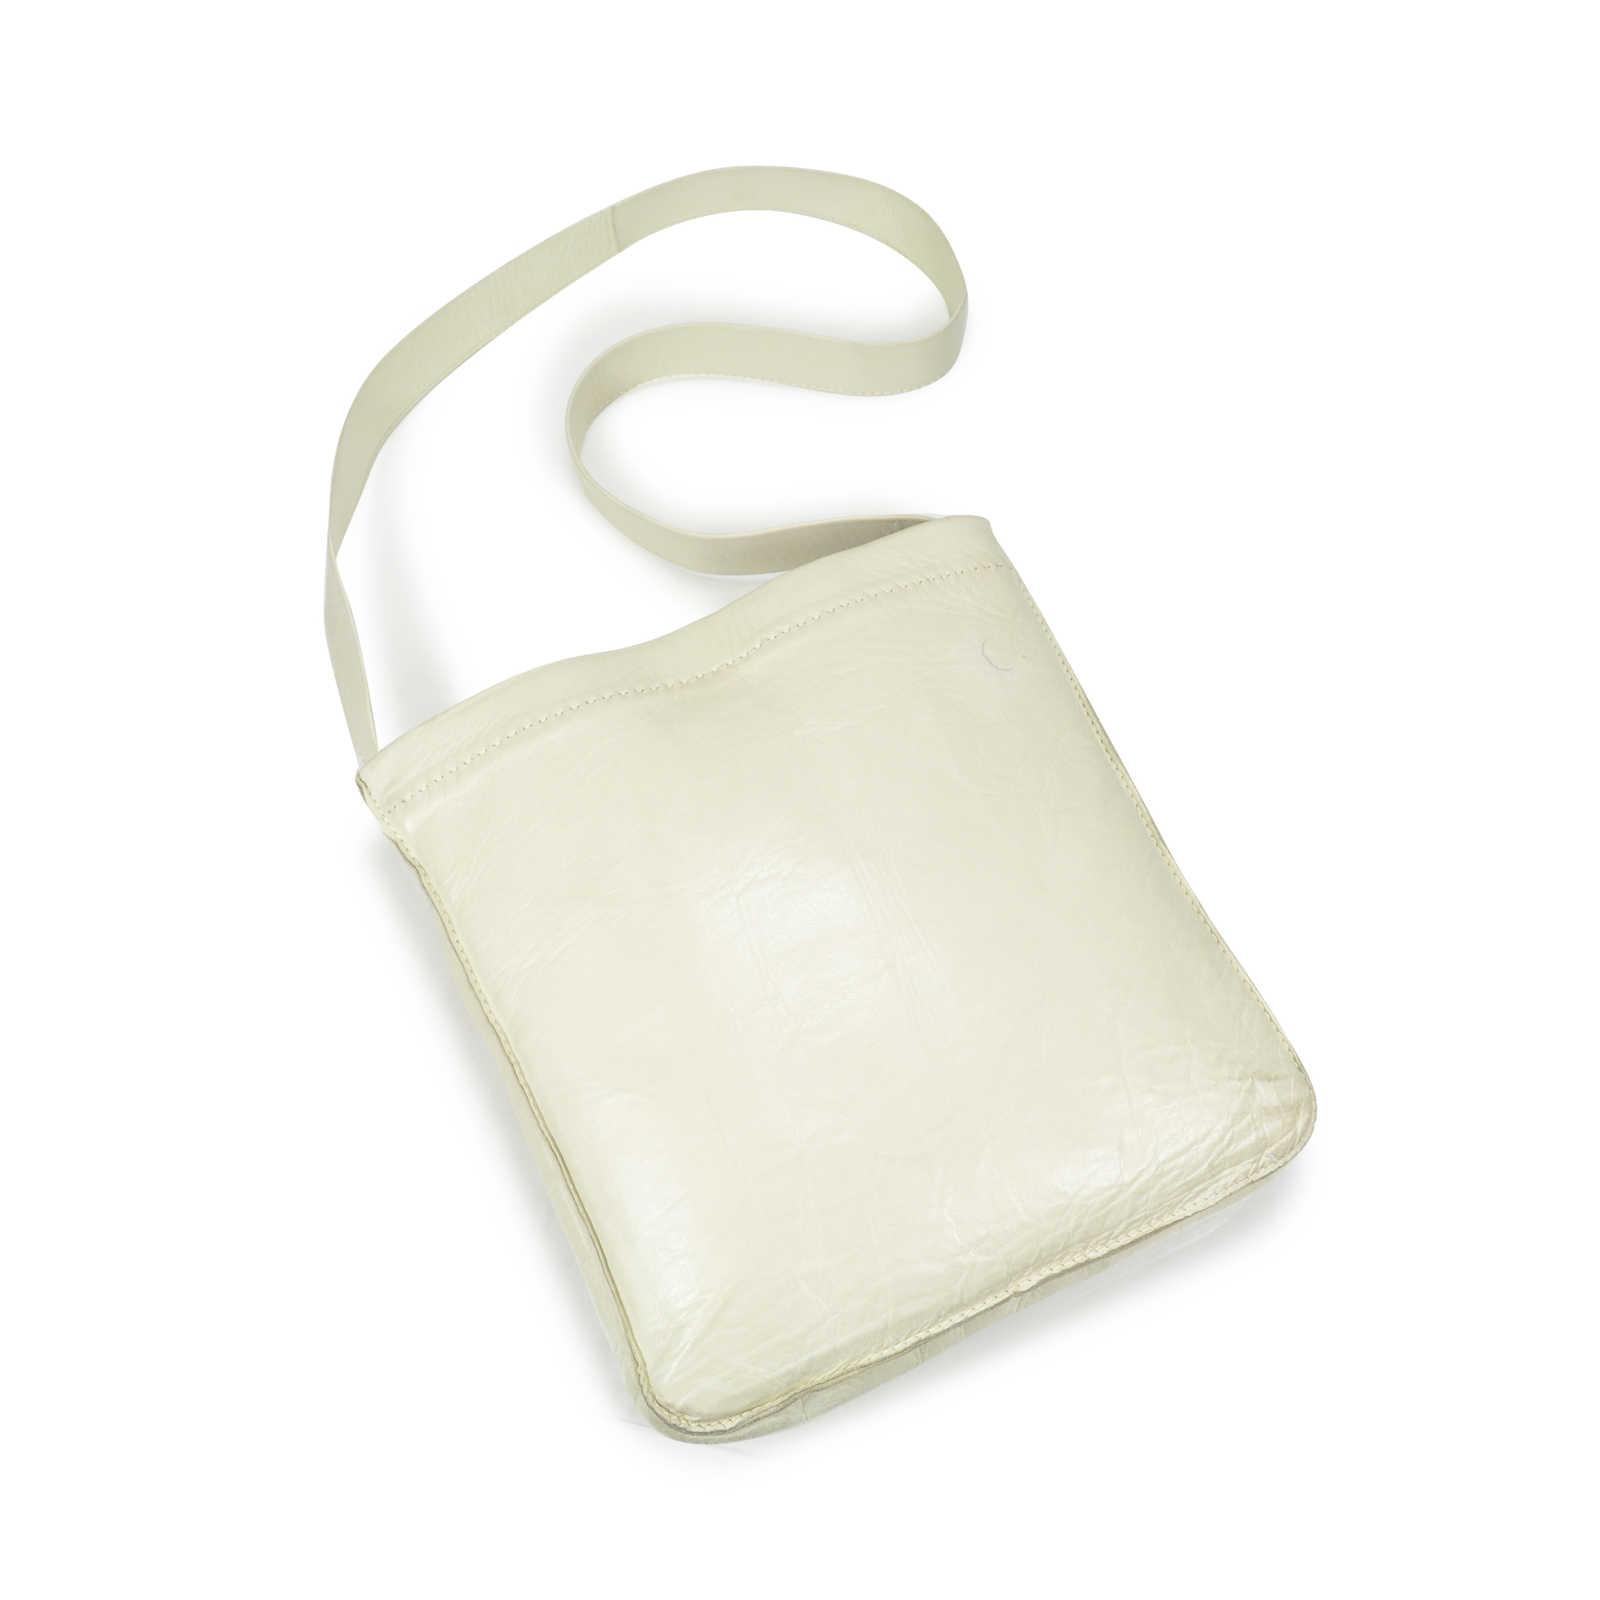 2cf3b73adbae ... Authentic Vintage Hermès Lambskin Sling Bag (TFC-101-00041) - Thumbnail  1 ...